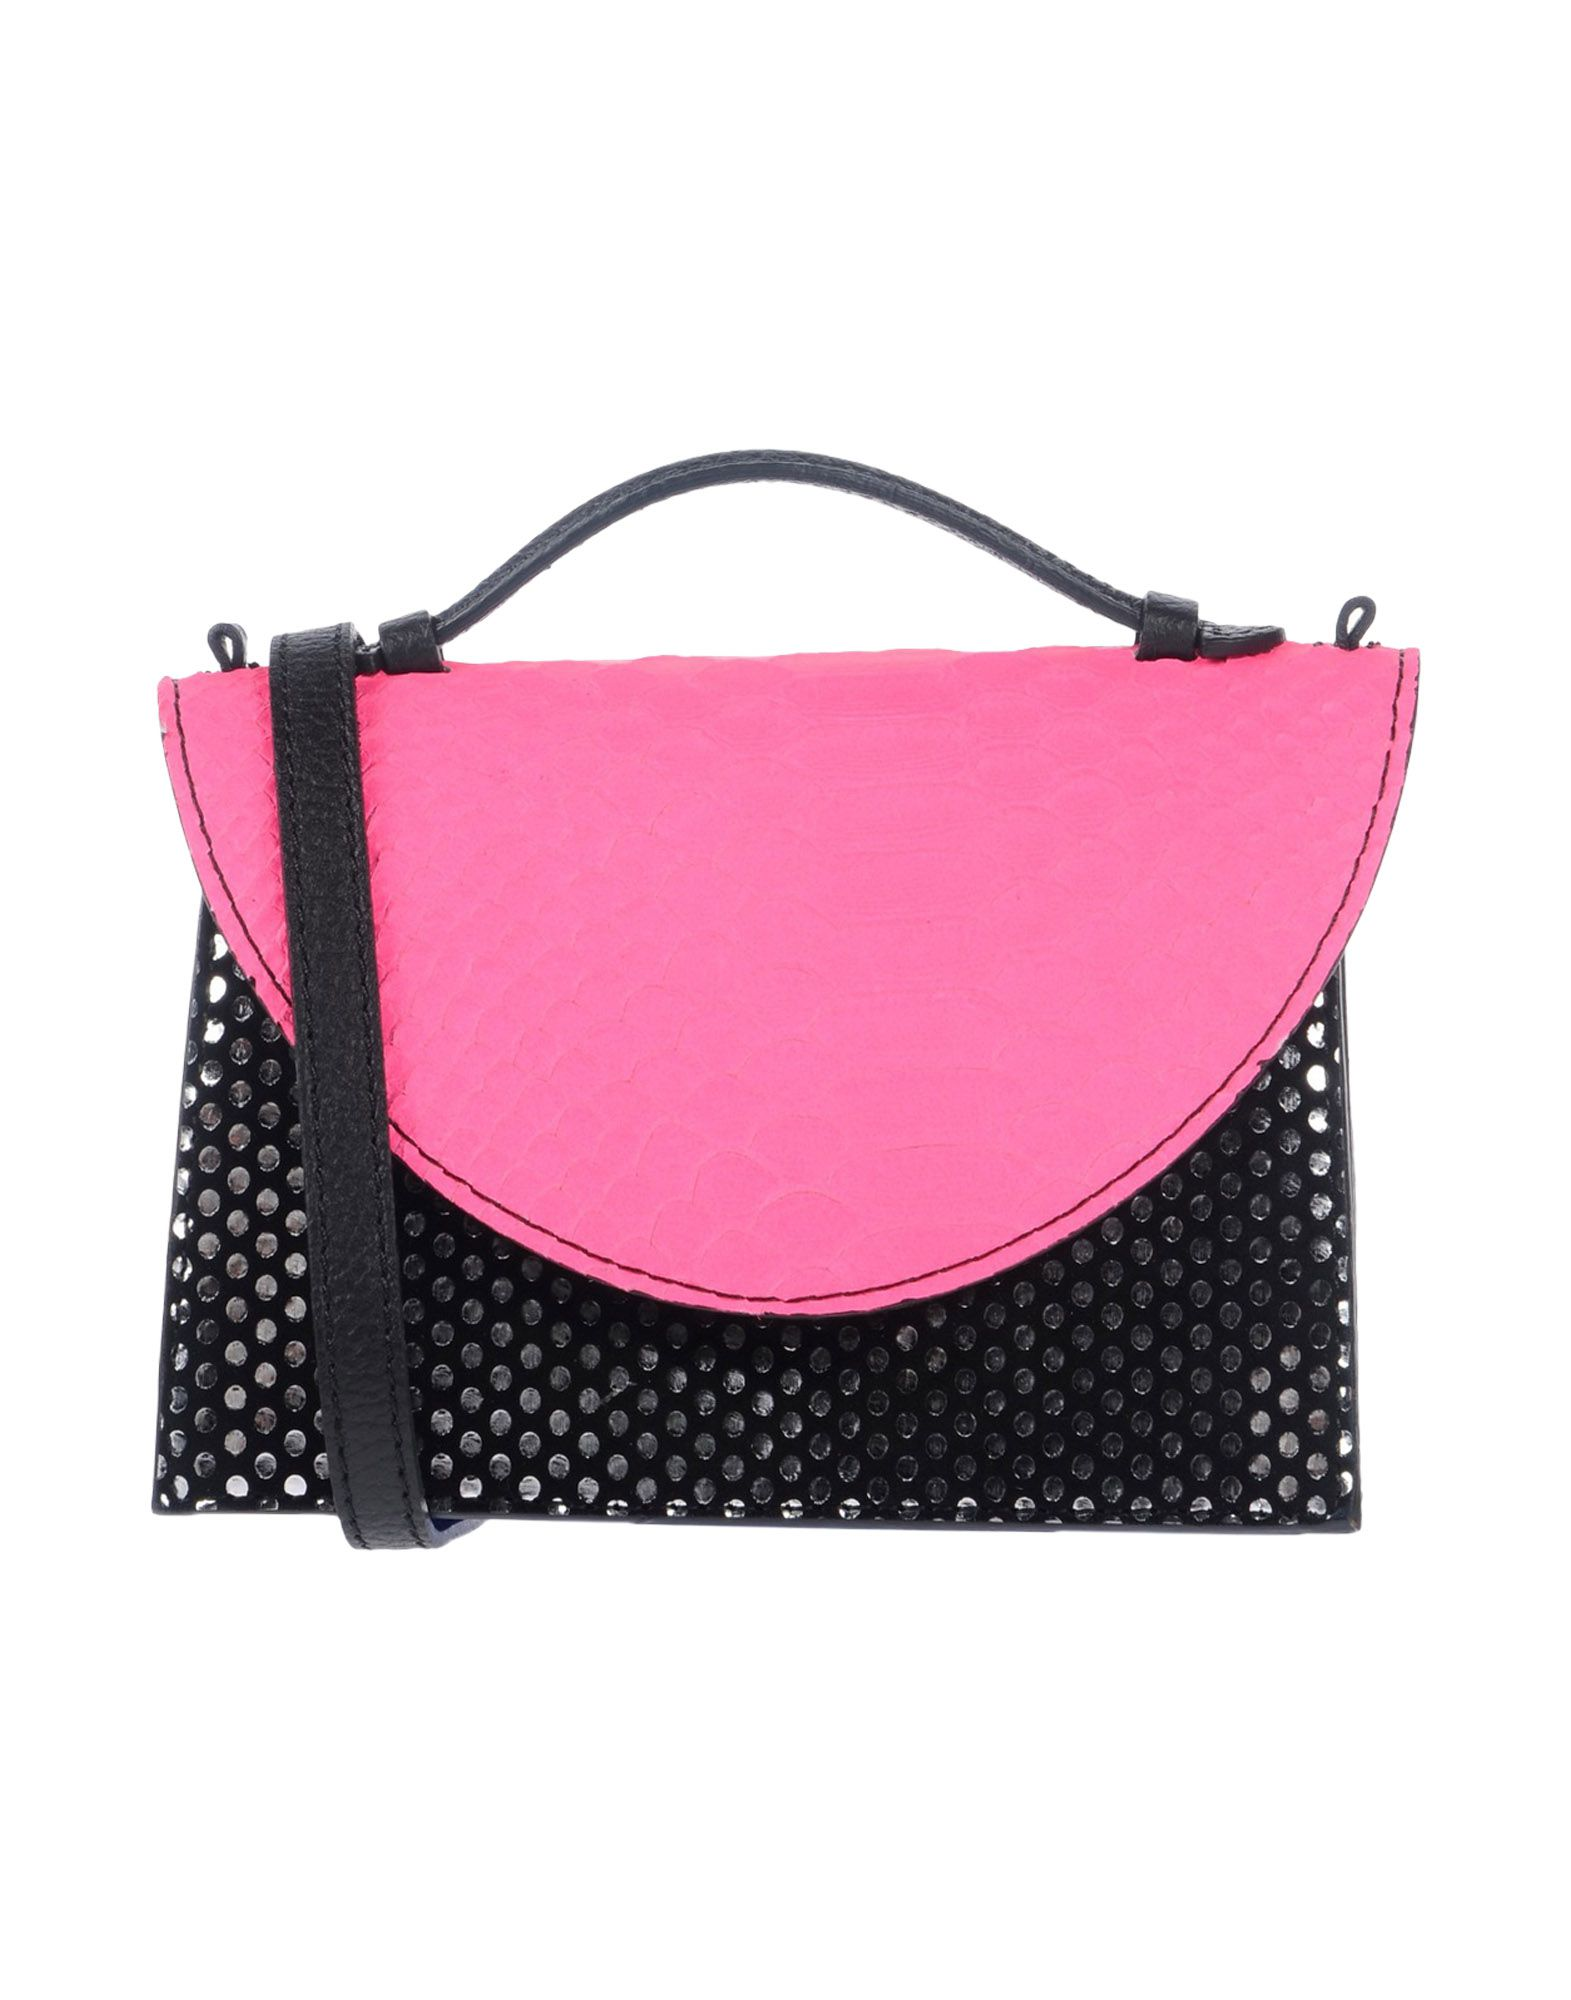 IMEMOI Handbag in Fuchsia